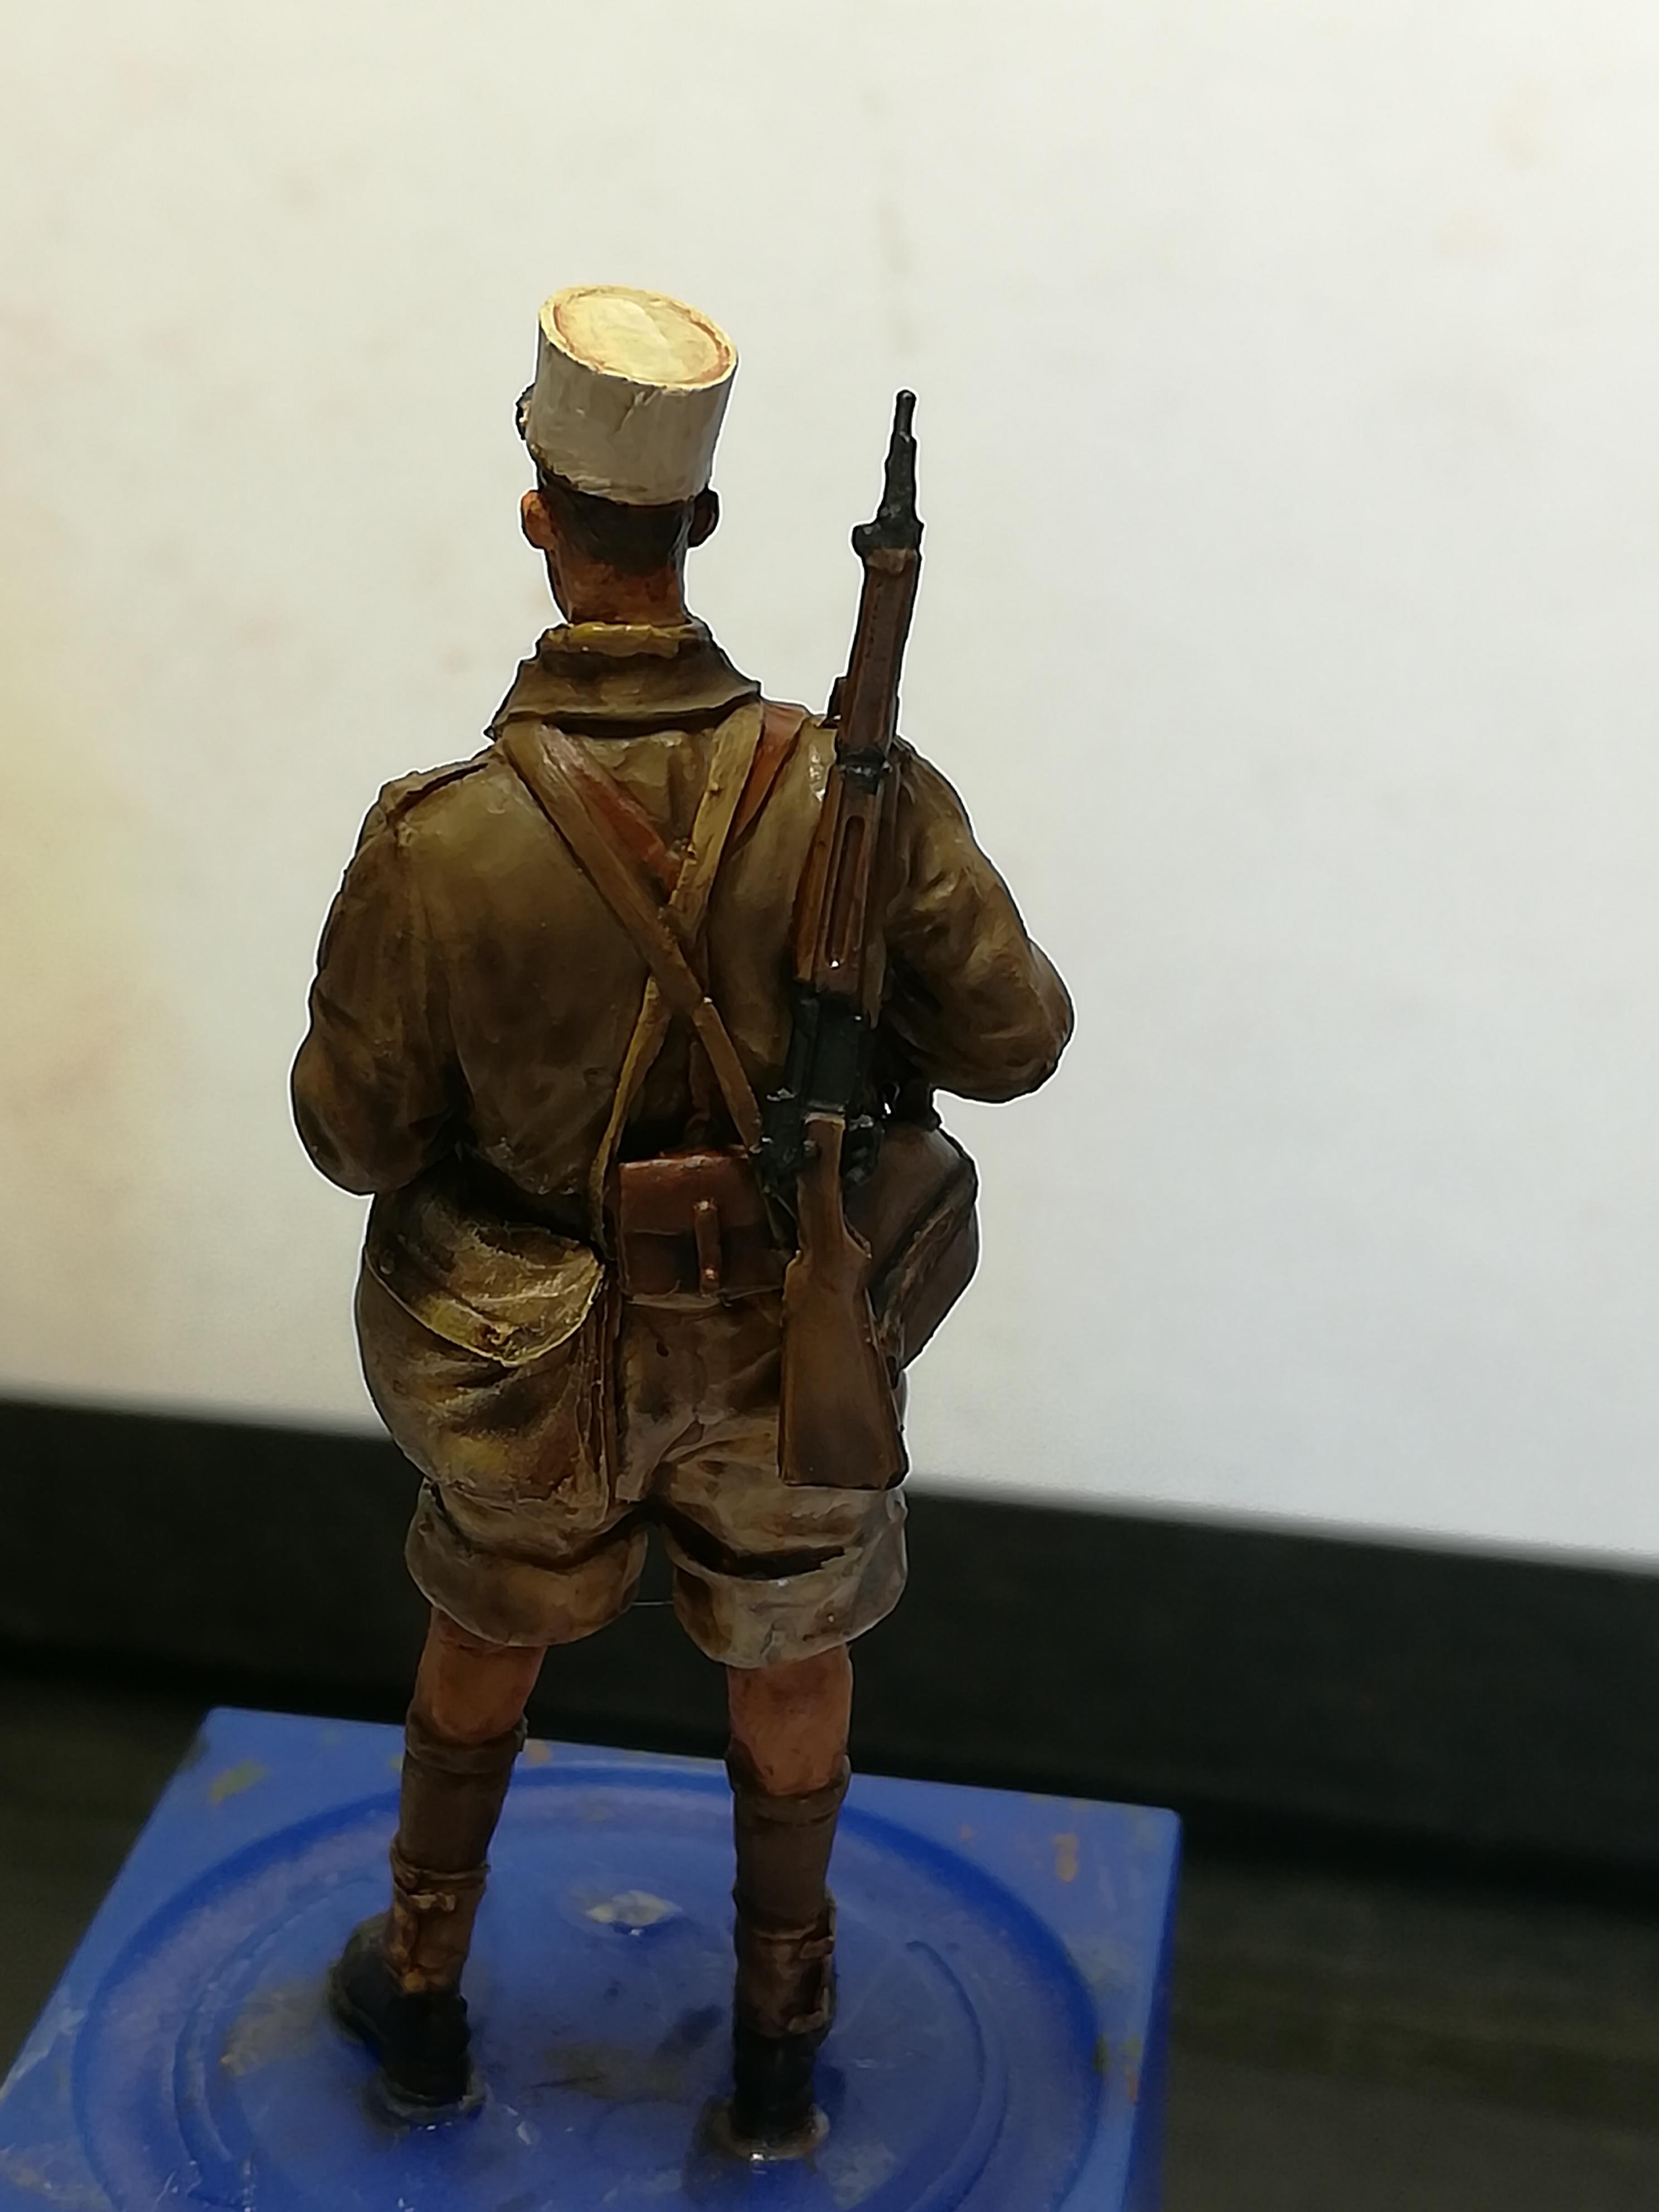 Les frères ennemis, Bir Hakeim, Libye, 1942 - Figurines Steelmasters 1/35 275924IMG20170904172435